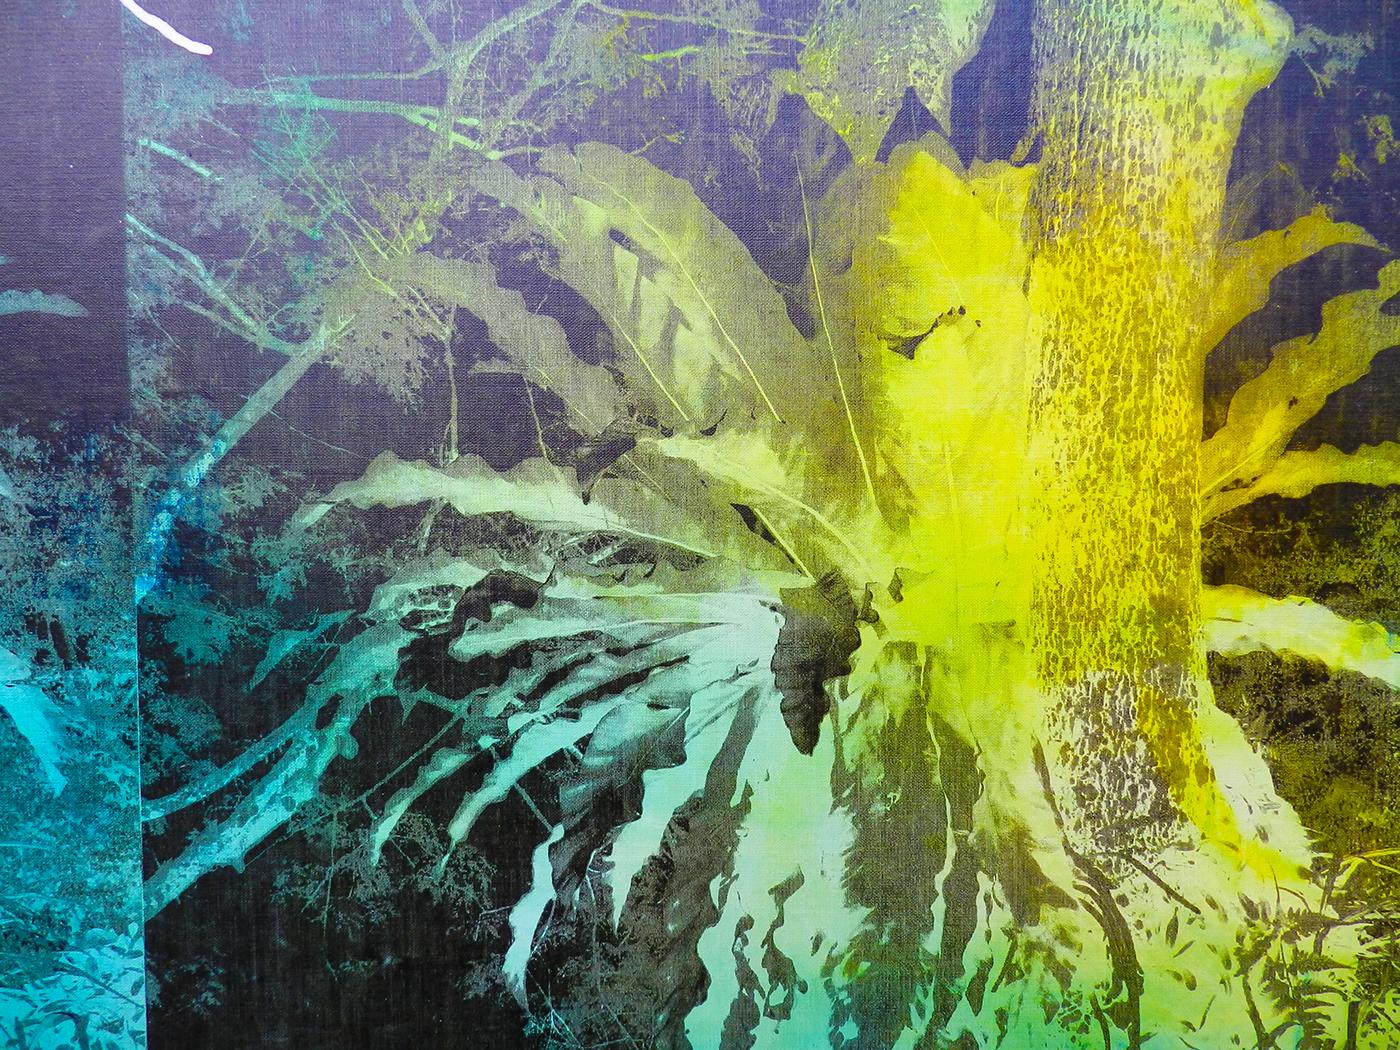 Tropical Nights Illuminated Close-Up2_RGB_low.jpg